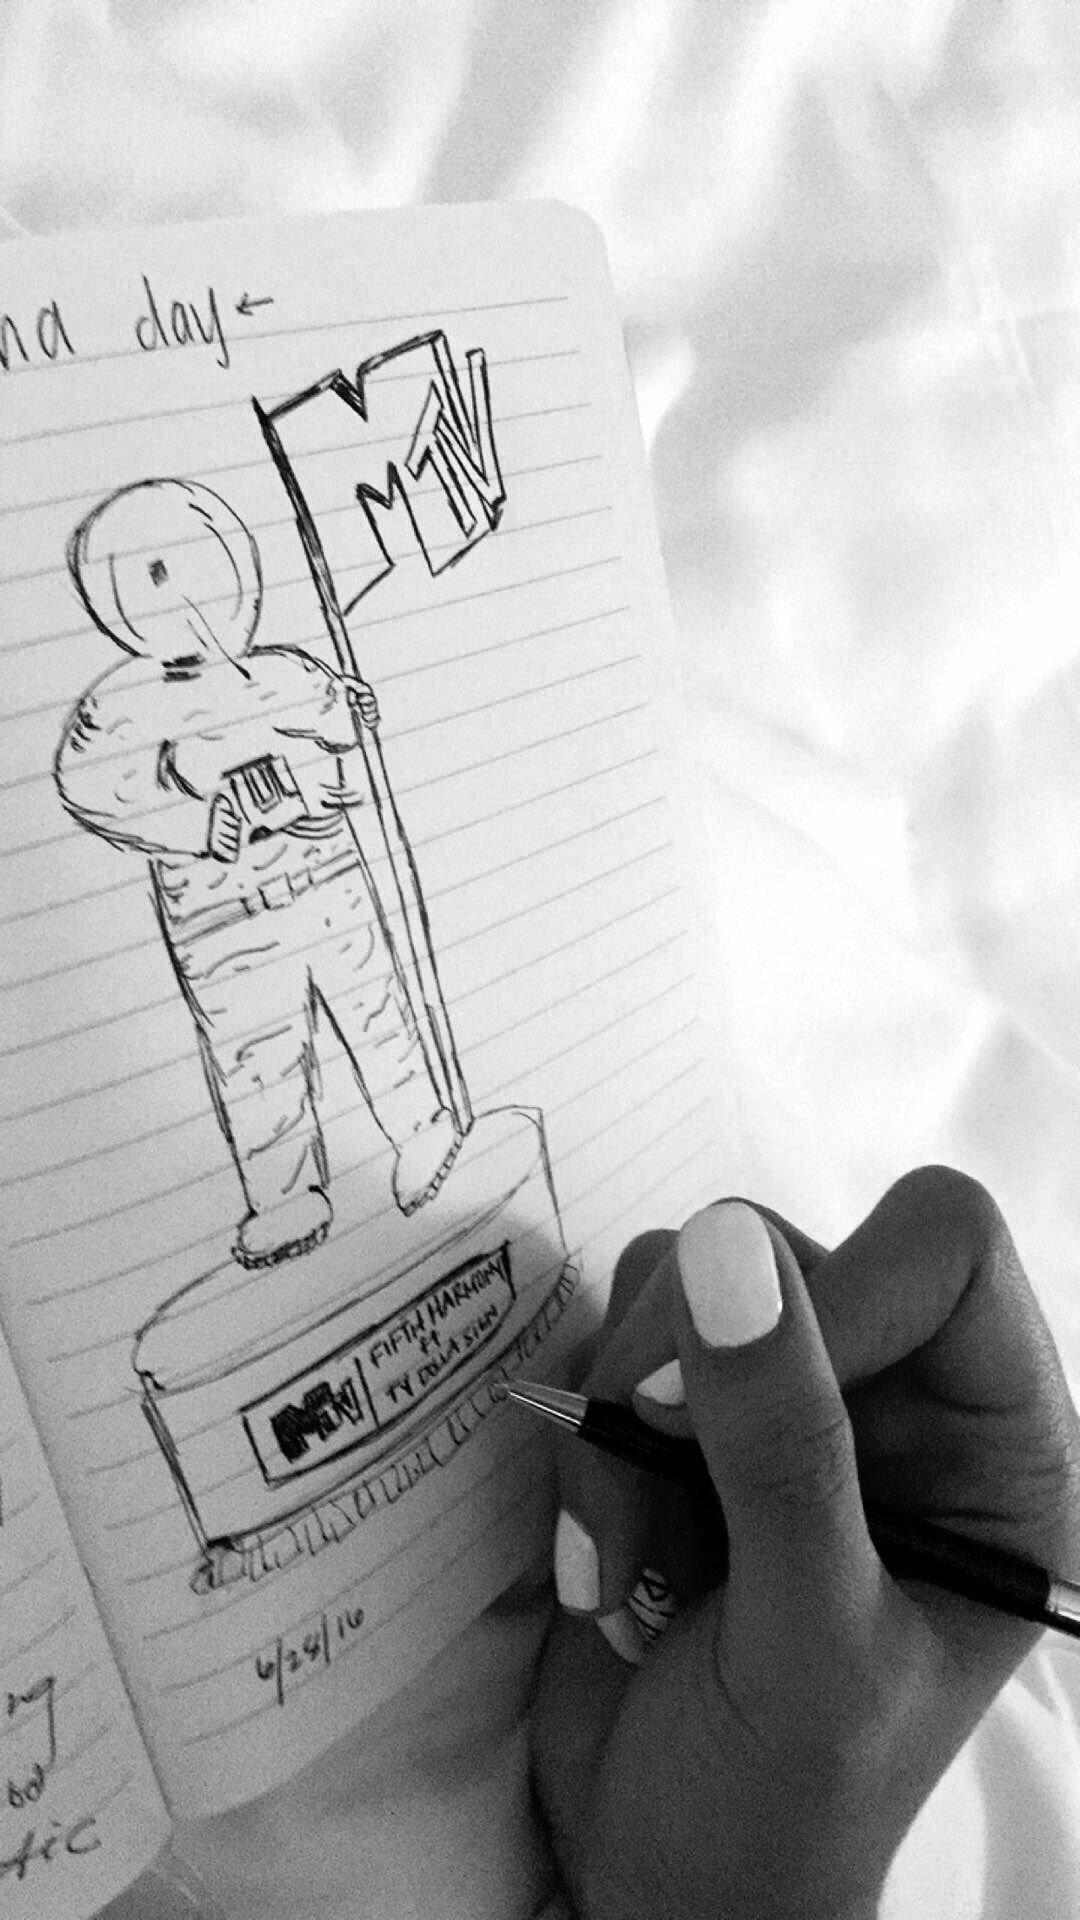 don't judge my doodle #VMAs2016 ��lol positive vibes today https://t.co/j67PIGY5af